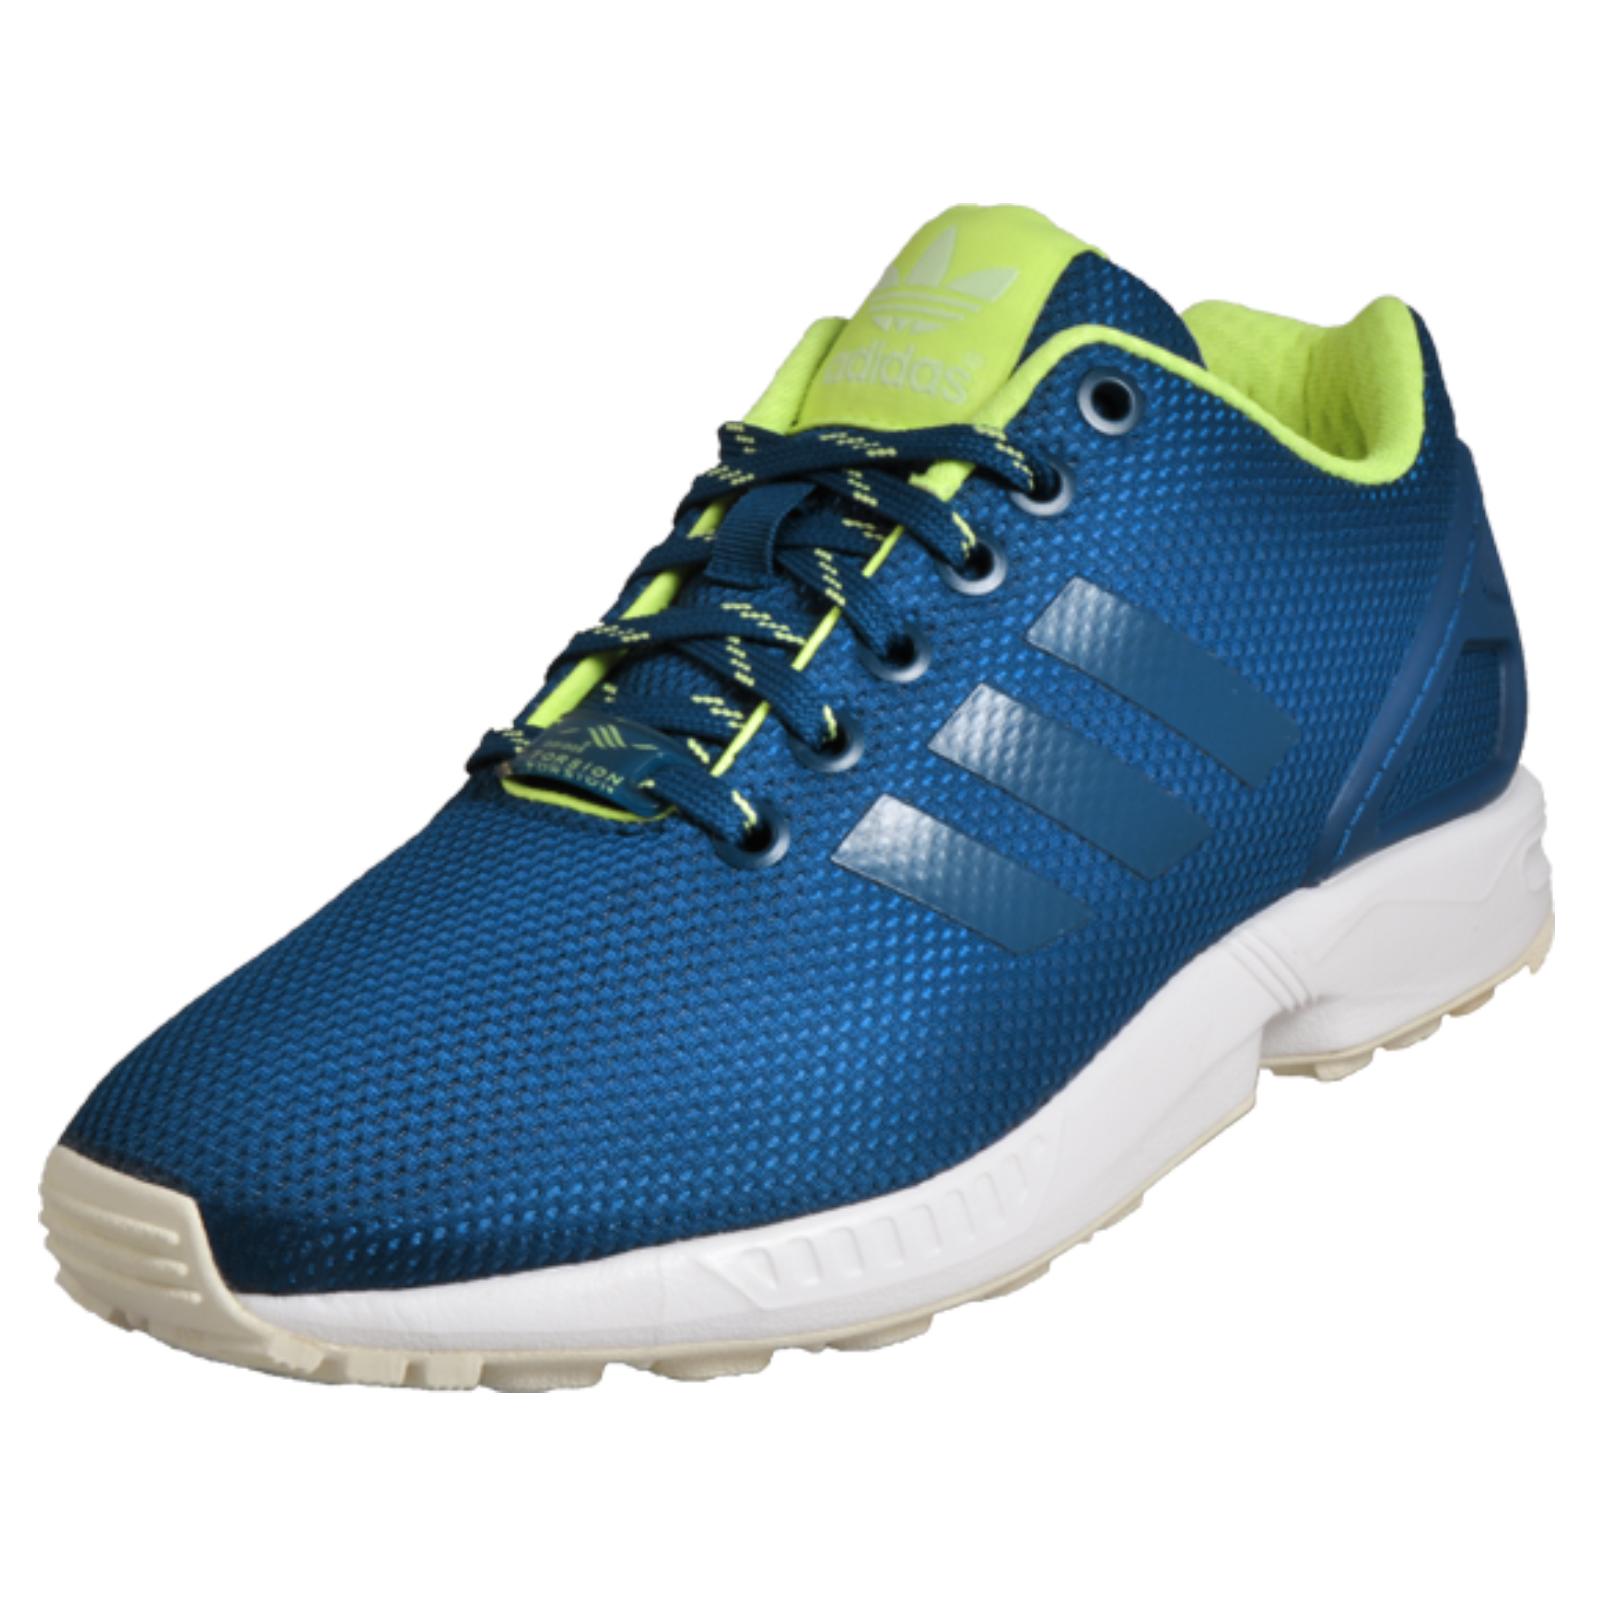 timeless design bc6ef 1dffa Details about Adidas Originals ZX Flux Unisex Classic Casual Retro Trainers  Blue